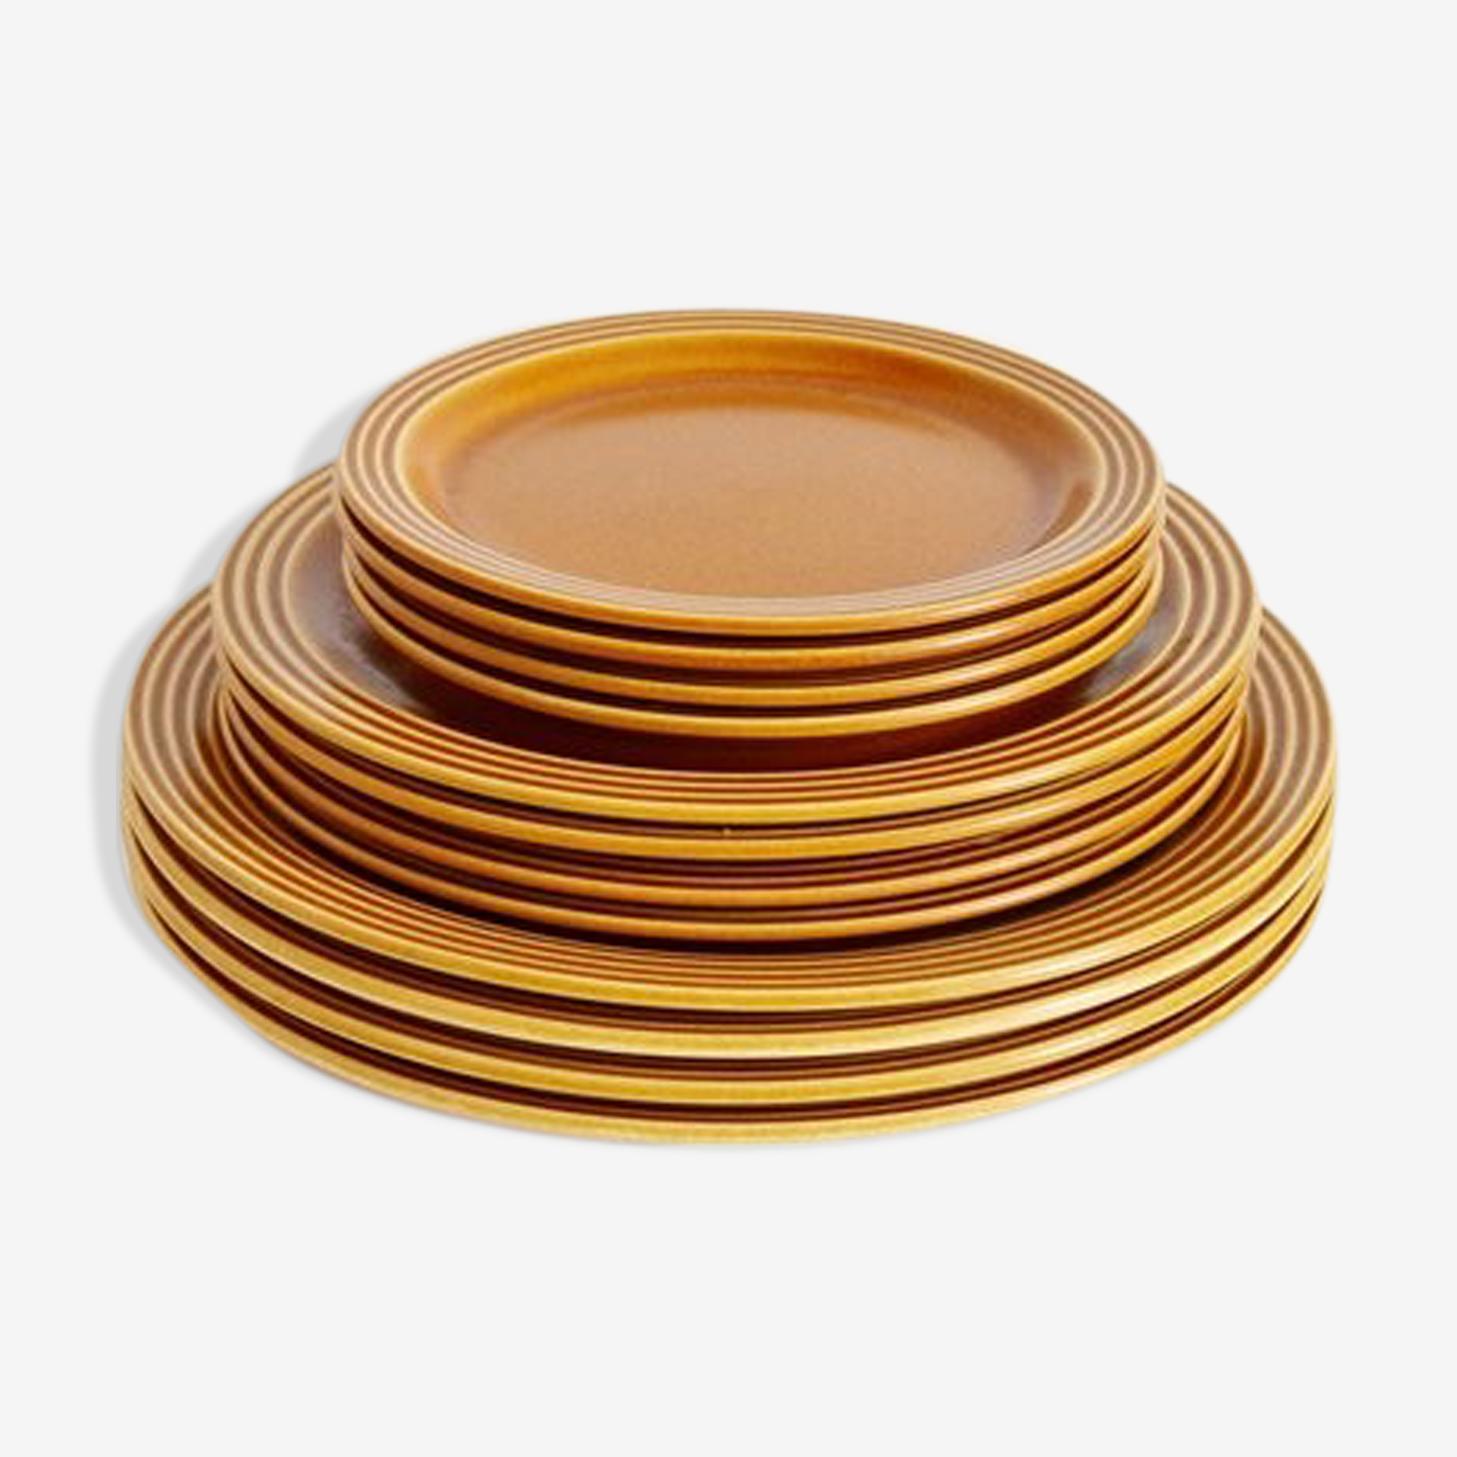 Set of 12 plates